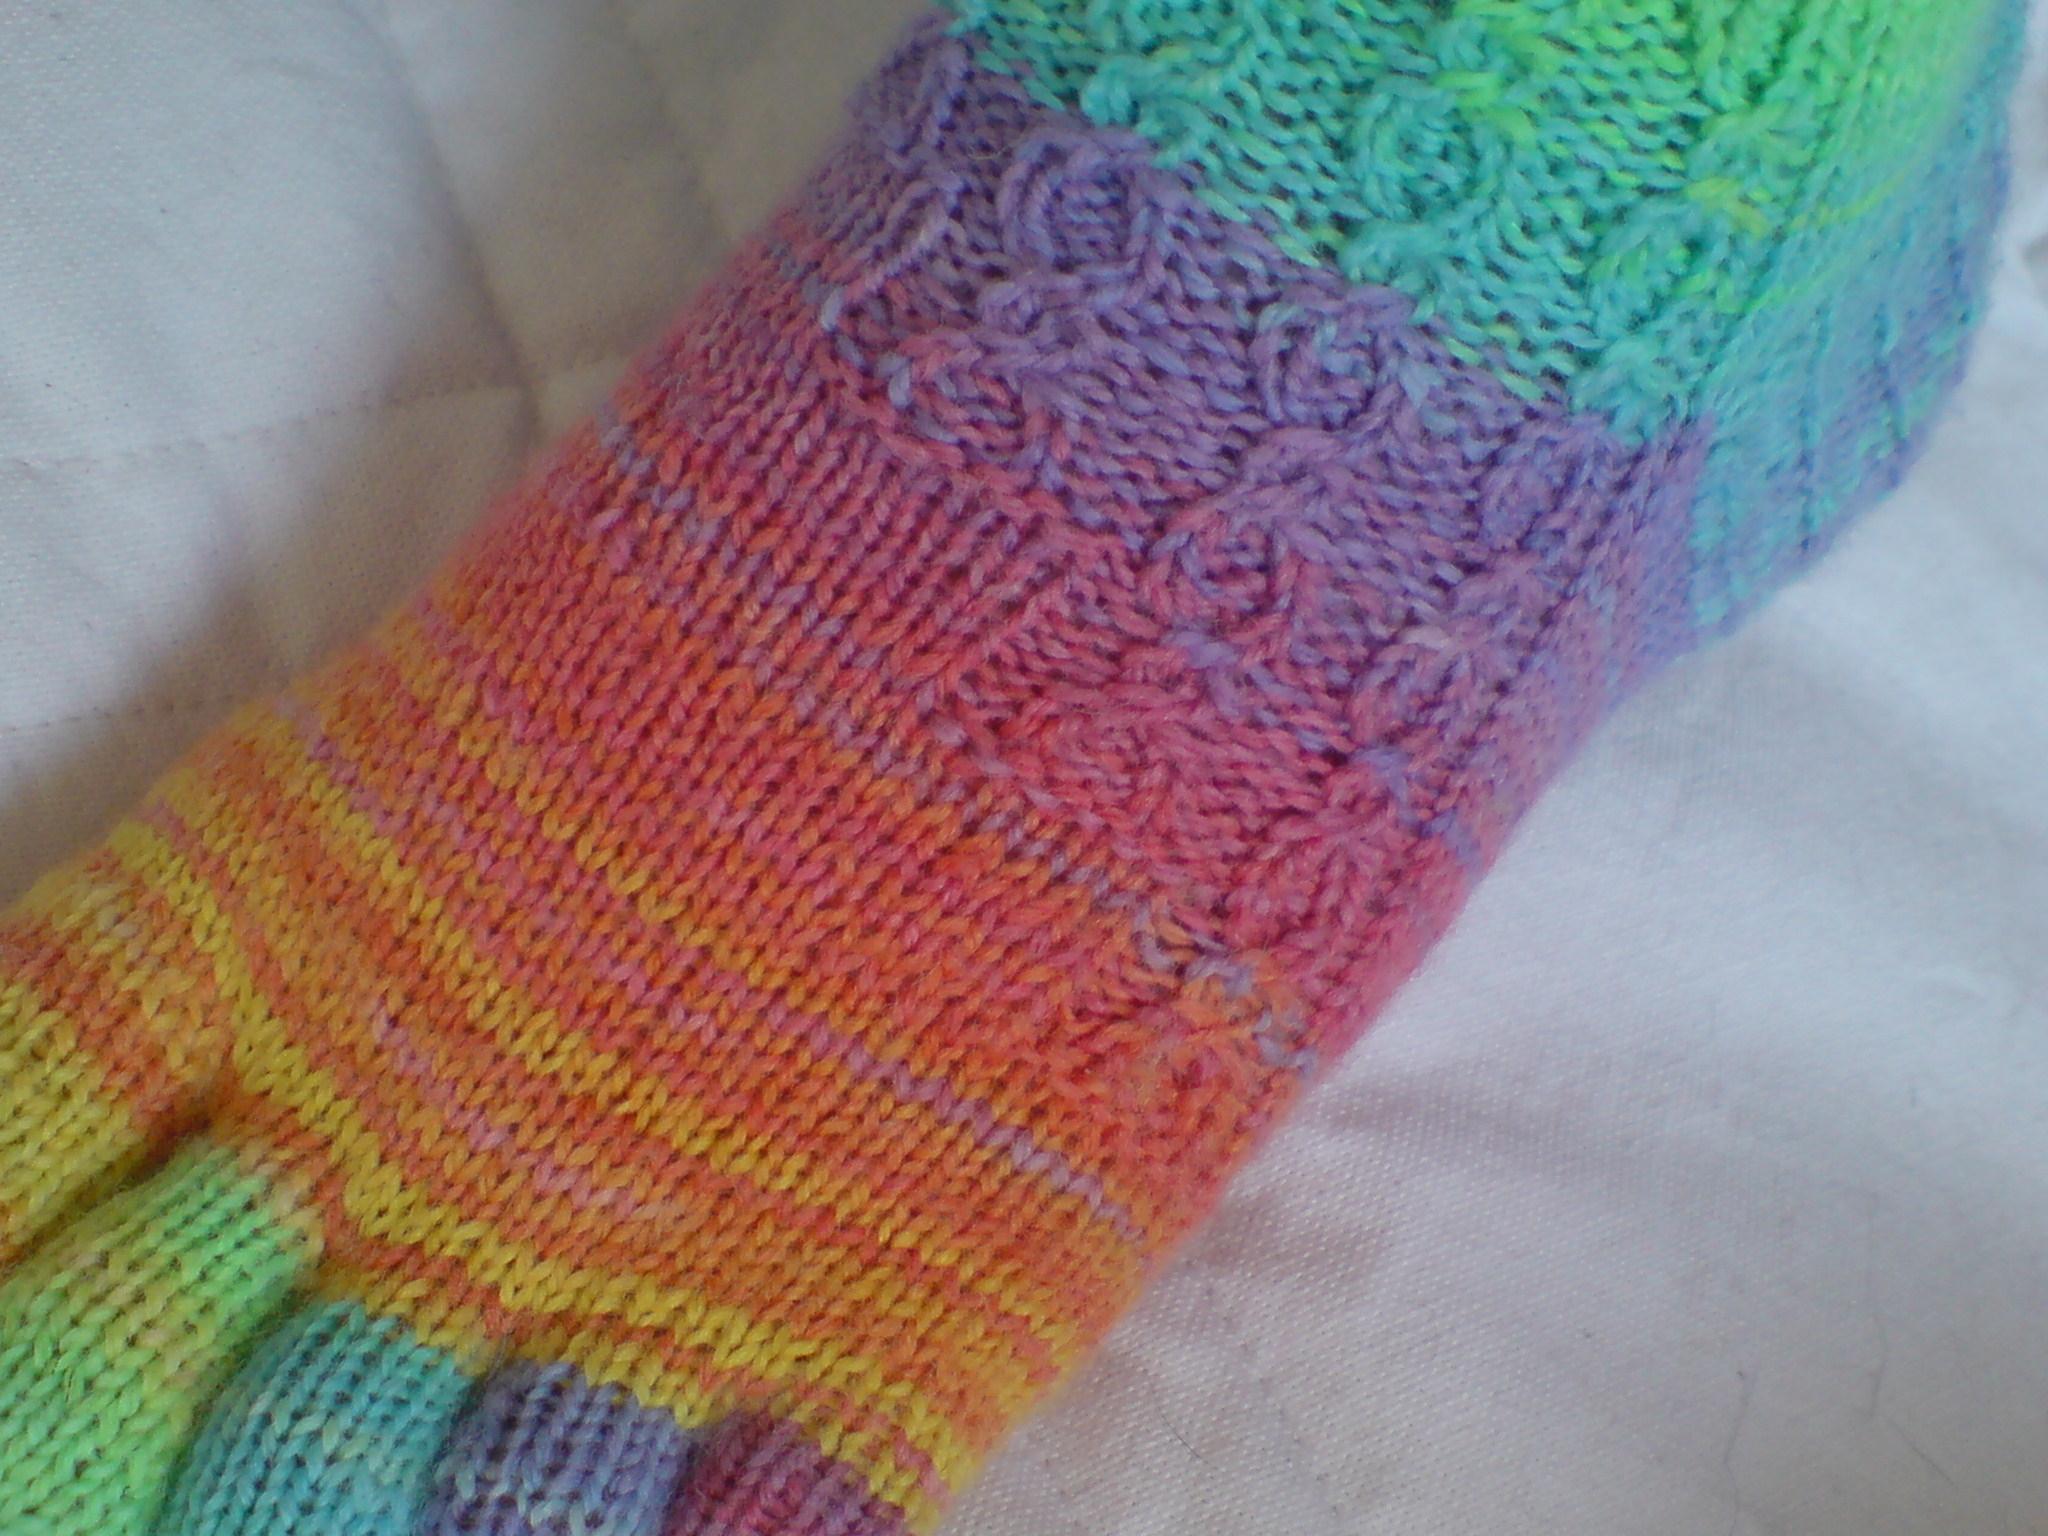 Toe Socks Knitting Pattern Sherbert Toe Socks Lyos August 2009 Loumms